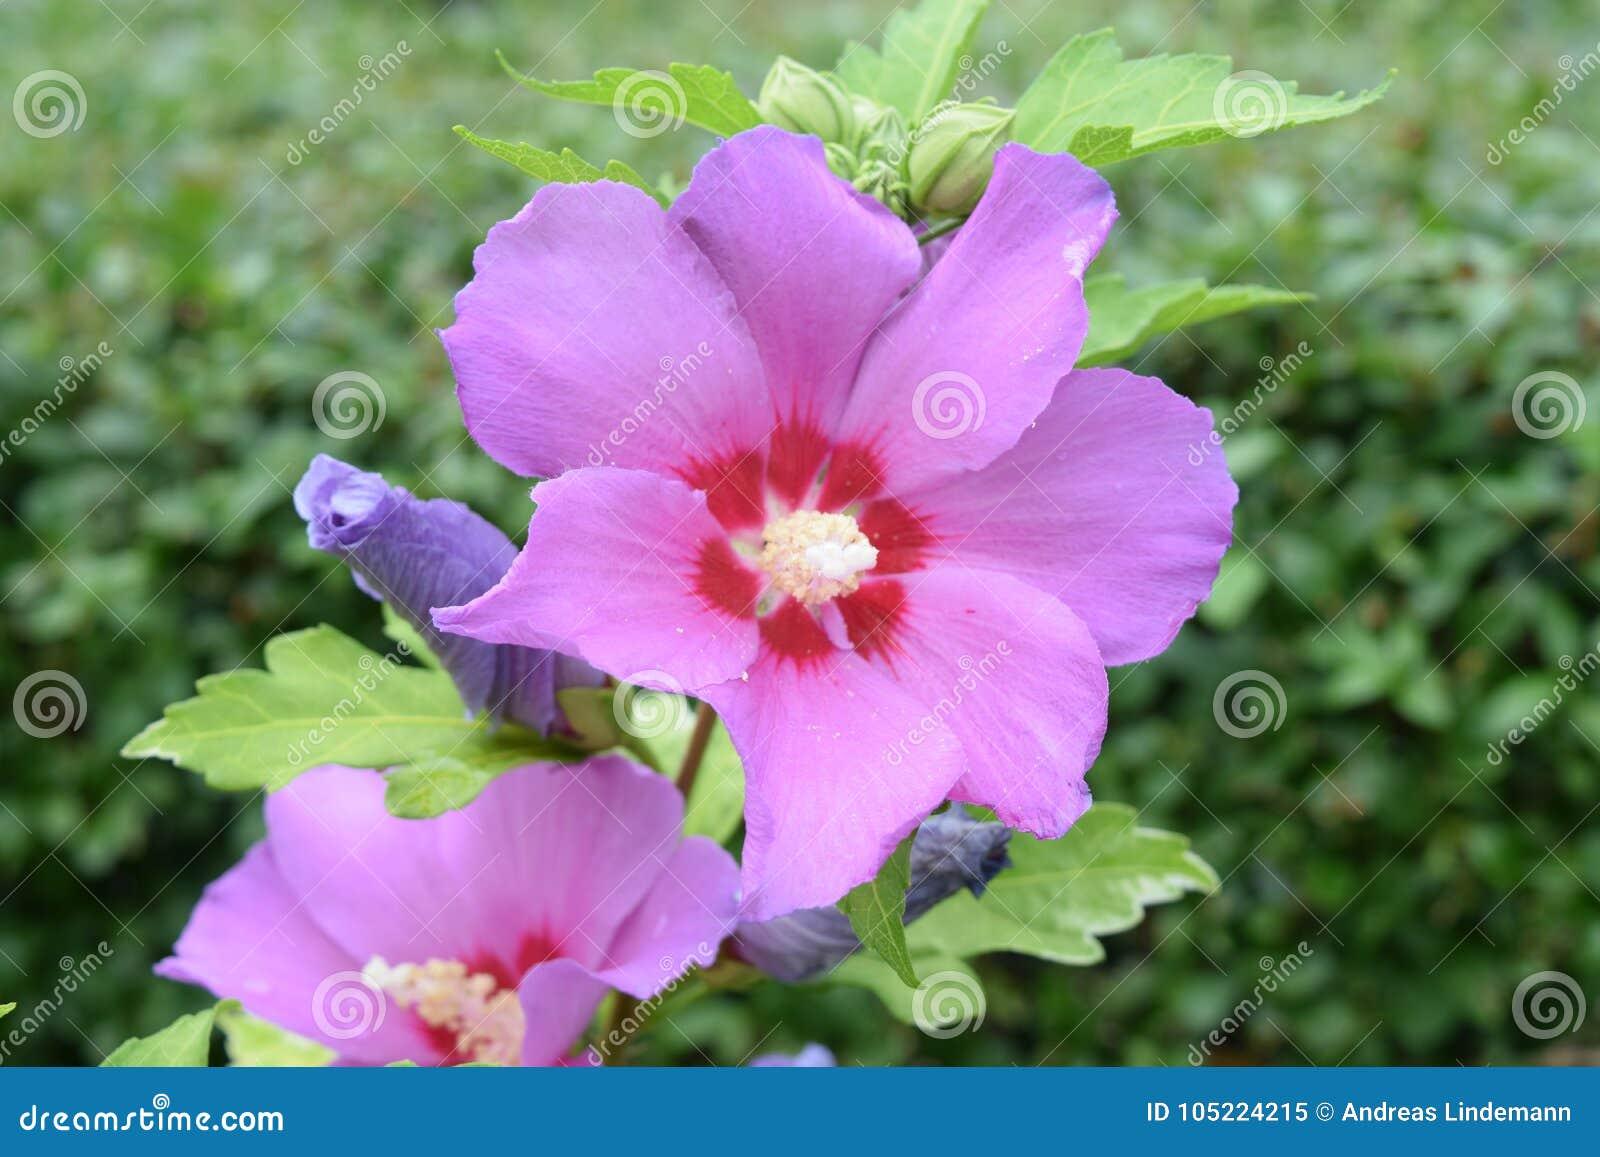 Wild hibiscus flower in pink stock image image of hibiscus bloom wild hibiscus flower in pink izmirmasajfo